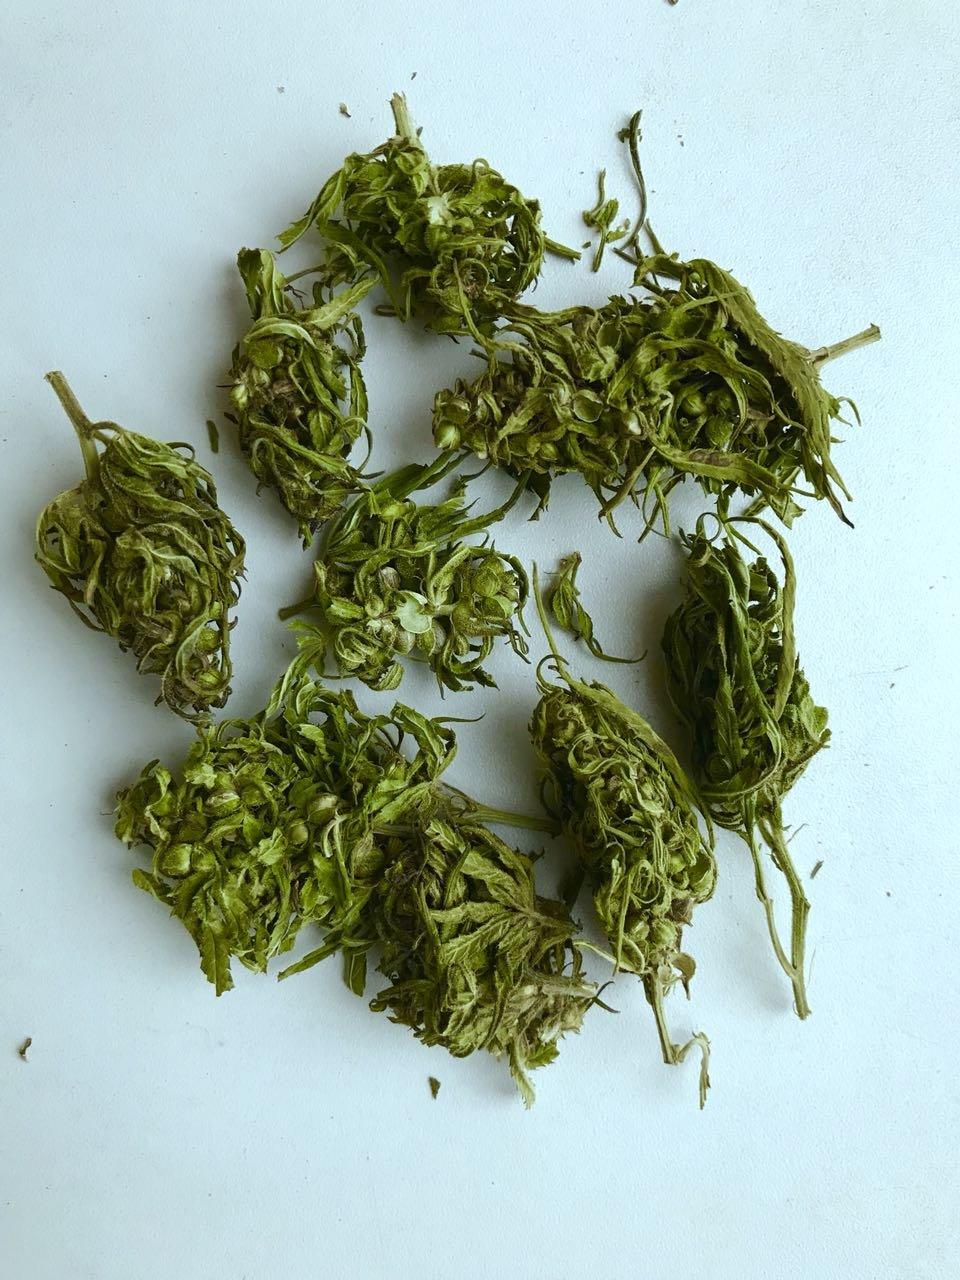 Cannabis sativa, hemp